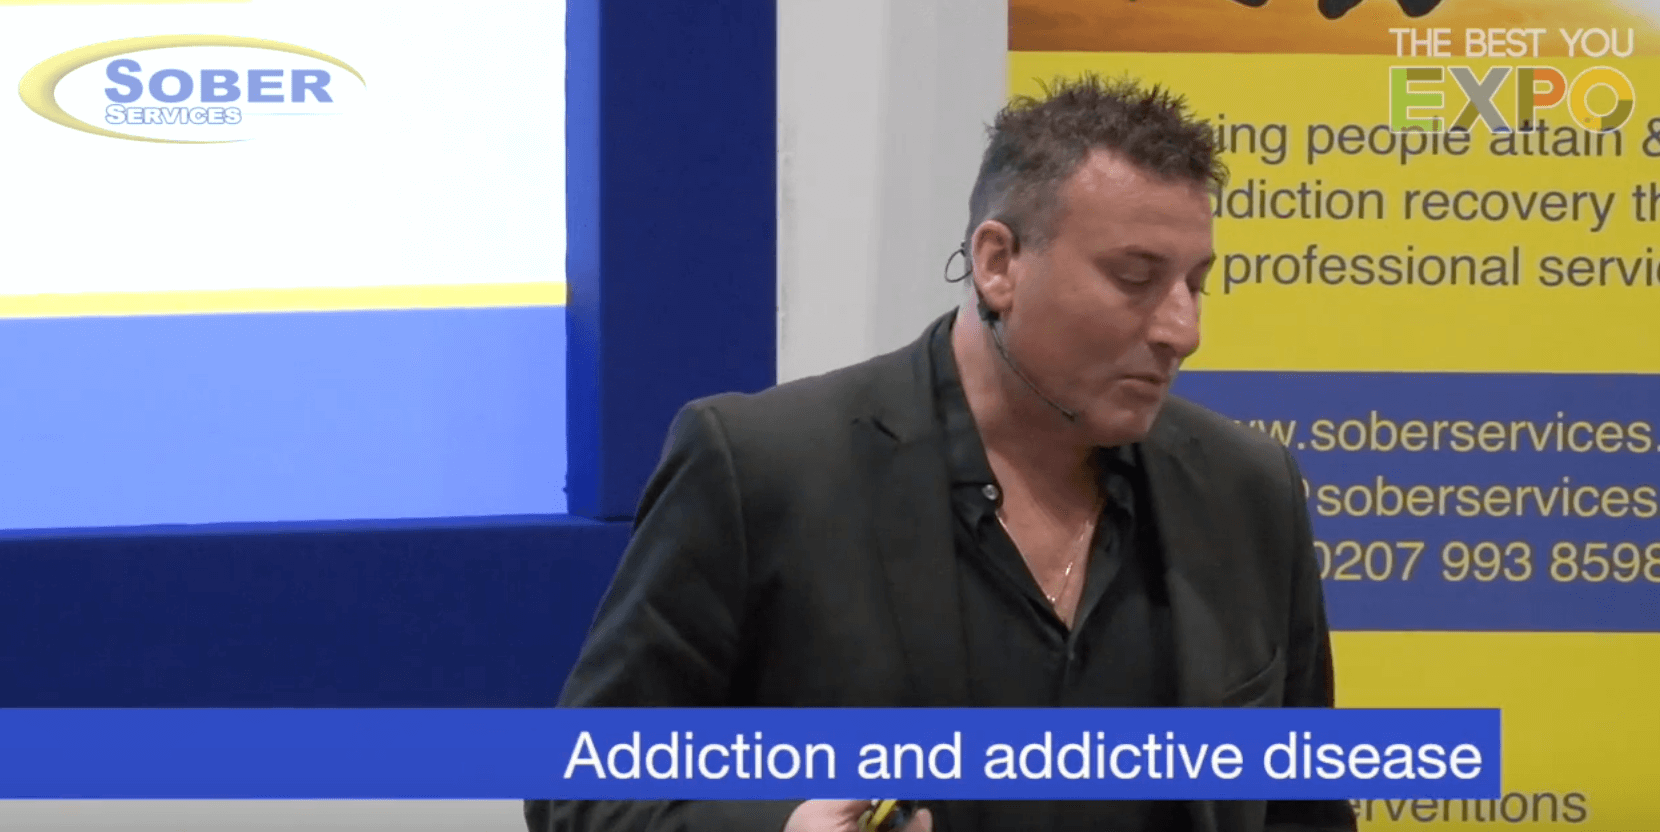 Addiction and addictive disease